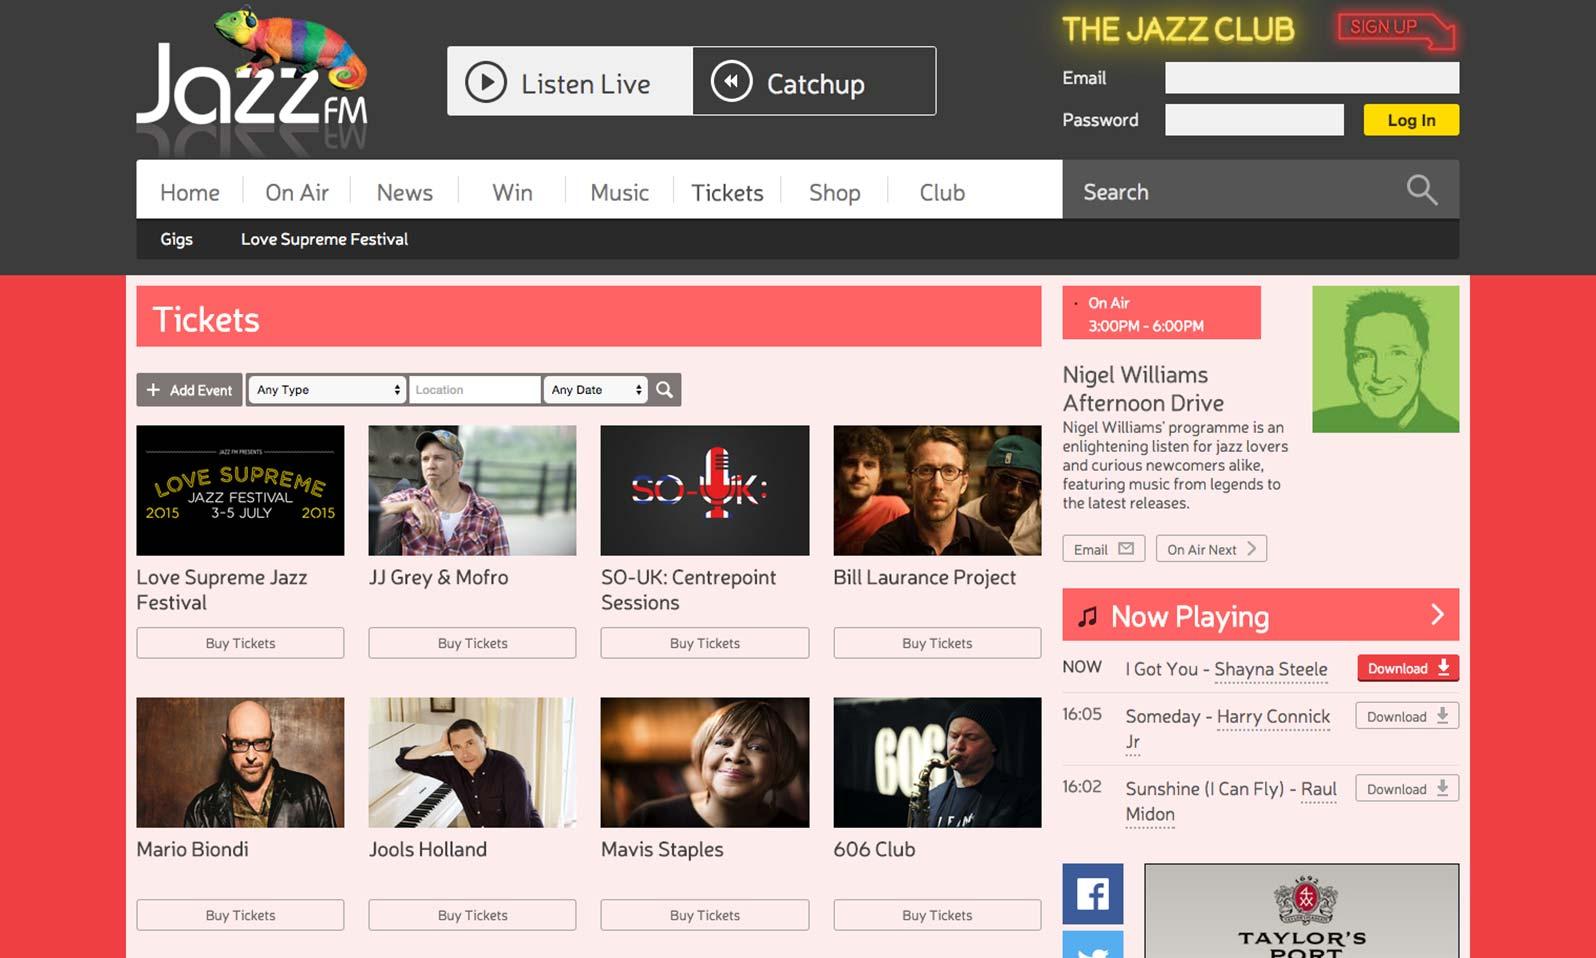 jazz fm dating live dating sites Indien